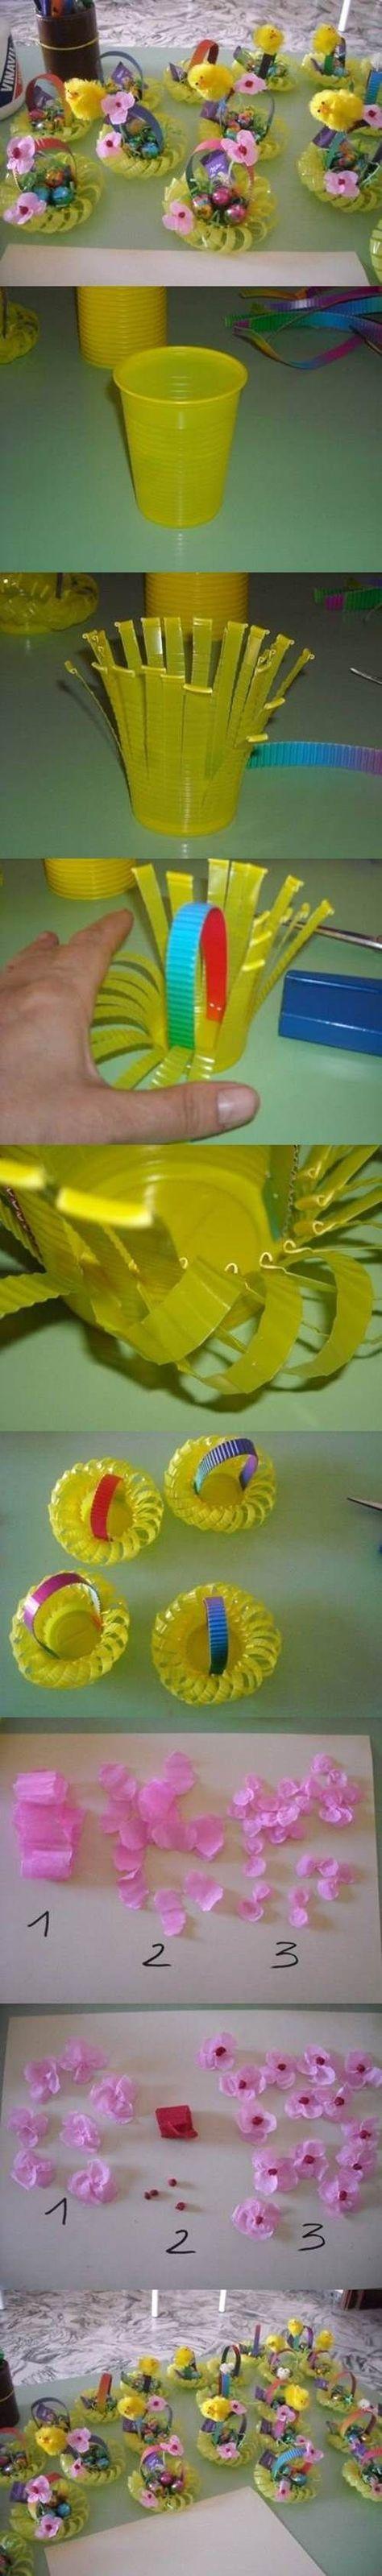 DIY Plastic Cup Easter Basket   iCreativeIdeas.com Follow Us on Facebook --> https://www.facebook.com/iCreativeIdeas